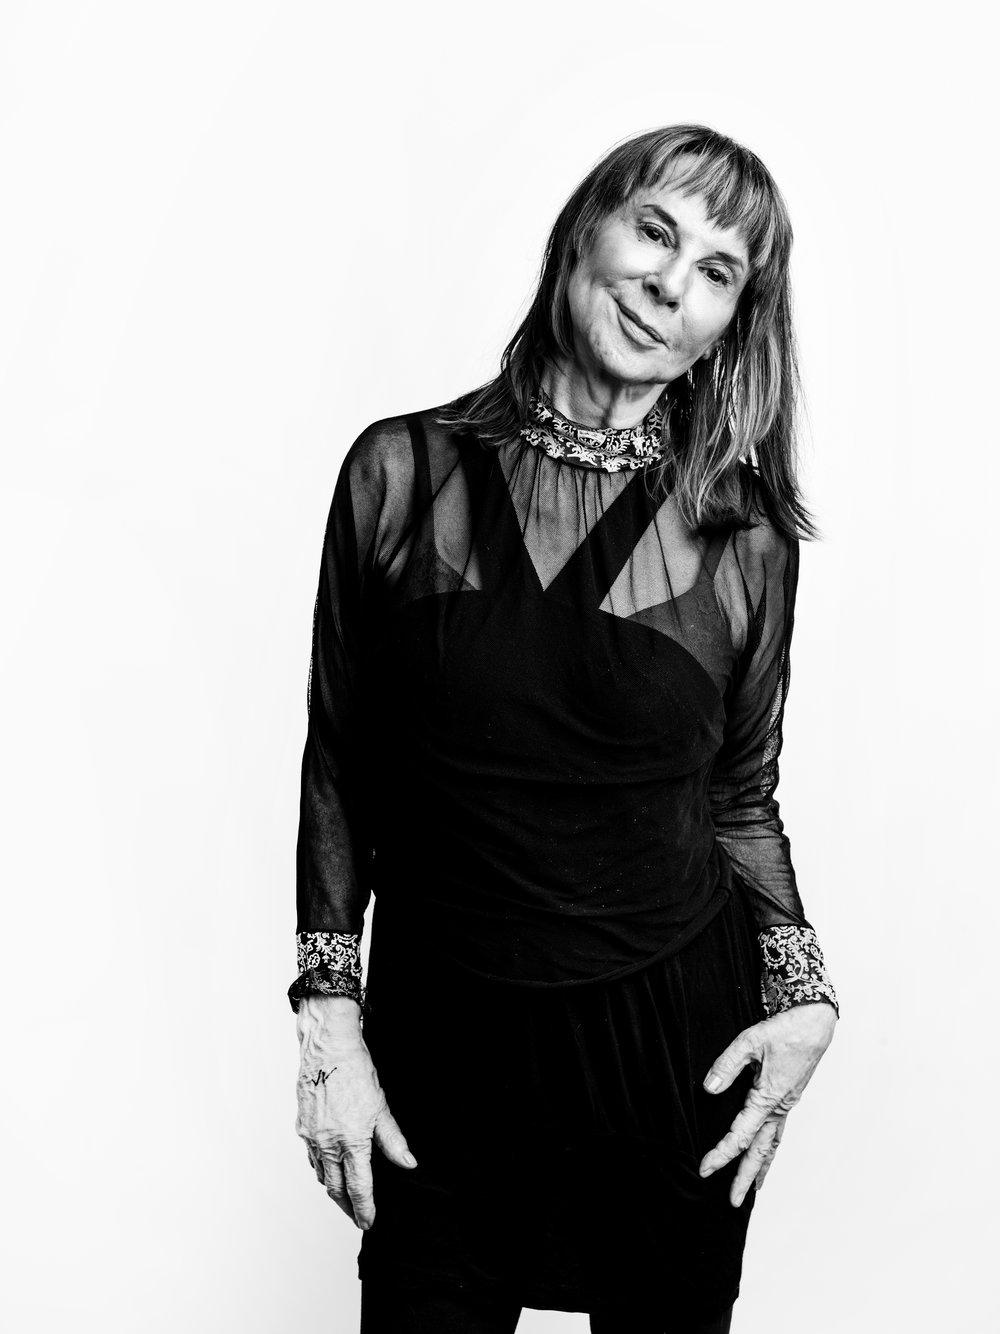 ELAINE ELLMAN | PHOTOGRAPHER, 1980s-1990s